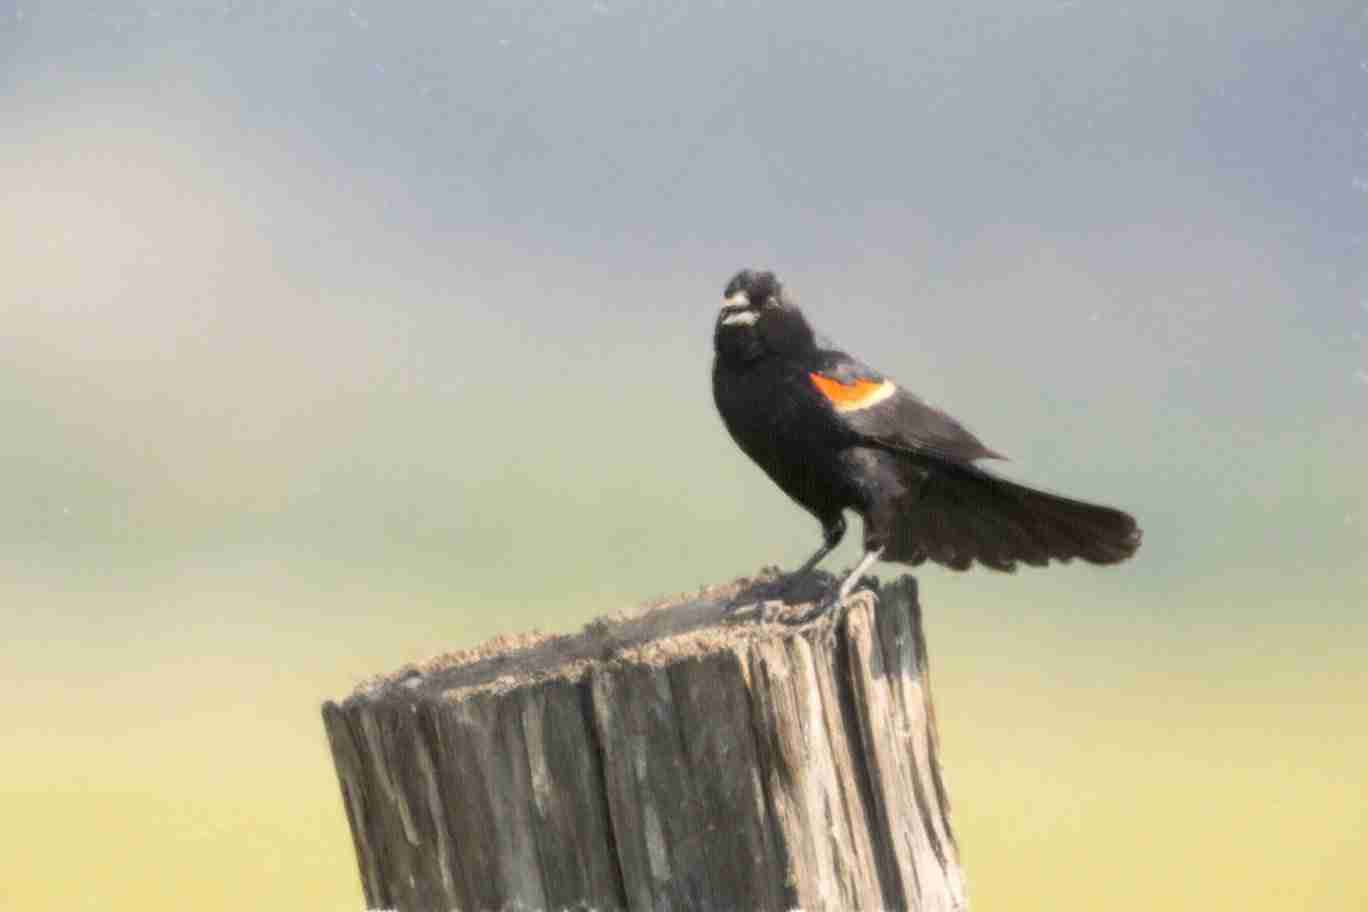 Print of a Chirping Blackbird